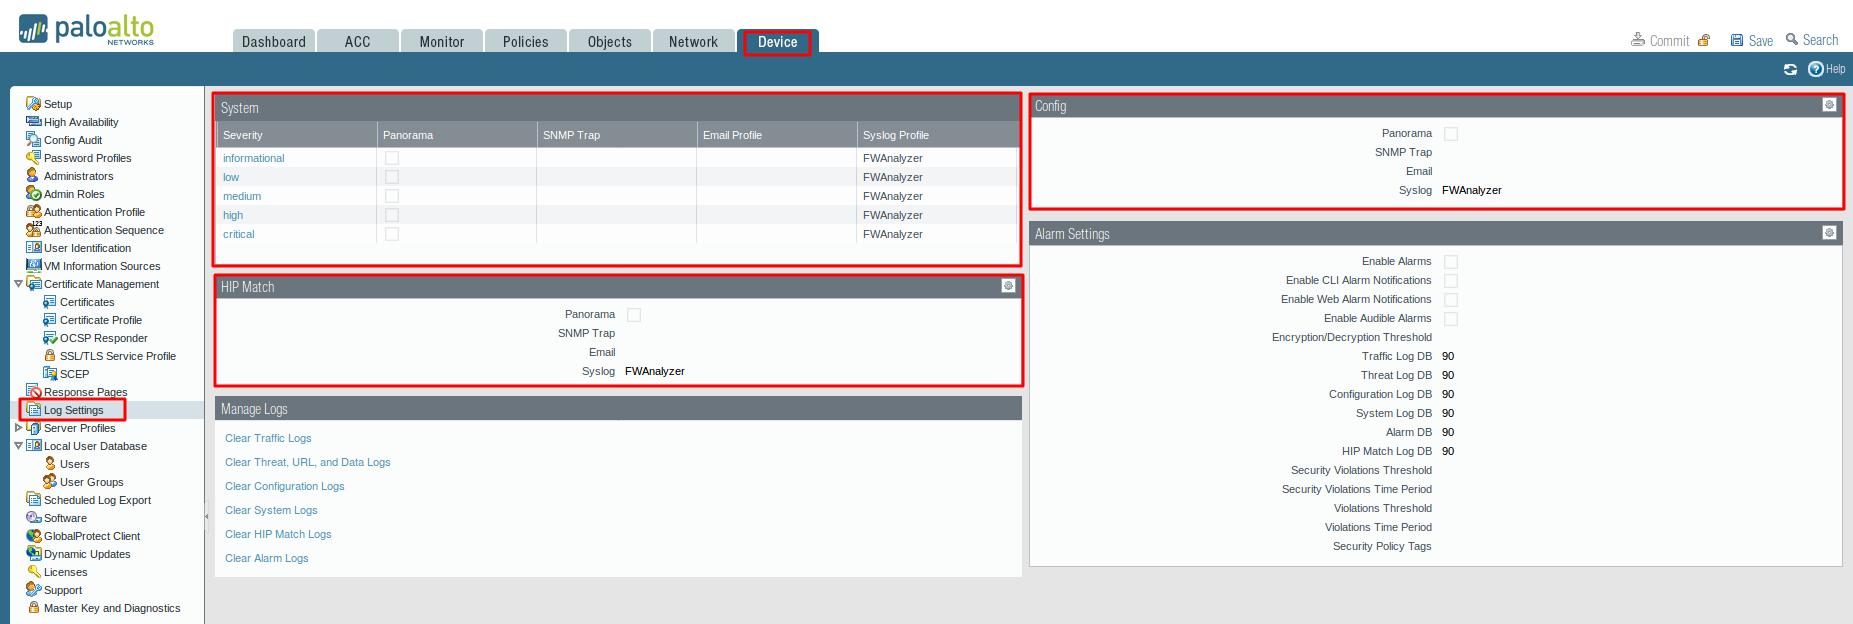 Configure PaloAlto Firewalls | Forward Syslog | Firewall